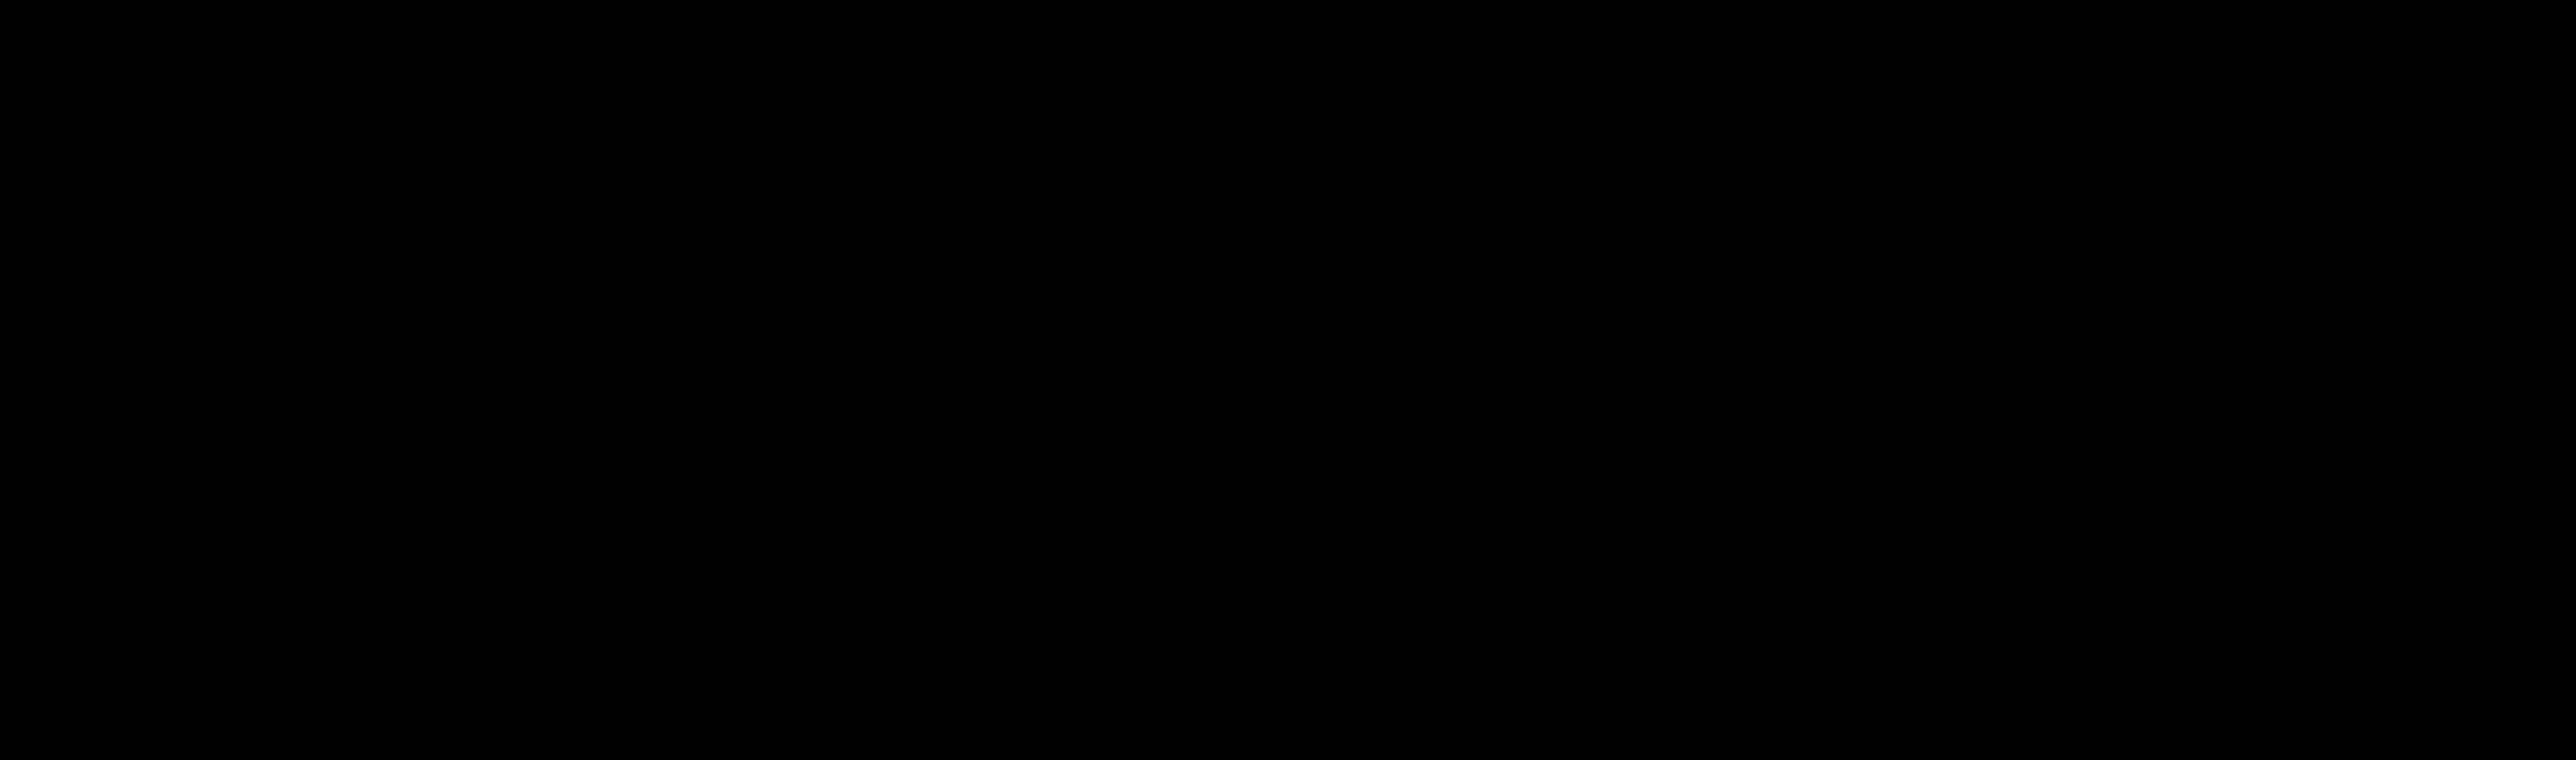 2-(Aminooxy)-N-(3-(2-(2-(3-(5-(dimethylamino)naphthalene-1-sulfonamido)propoxy)ethoxy)ethoxy)propyl)acetamide